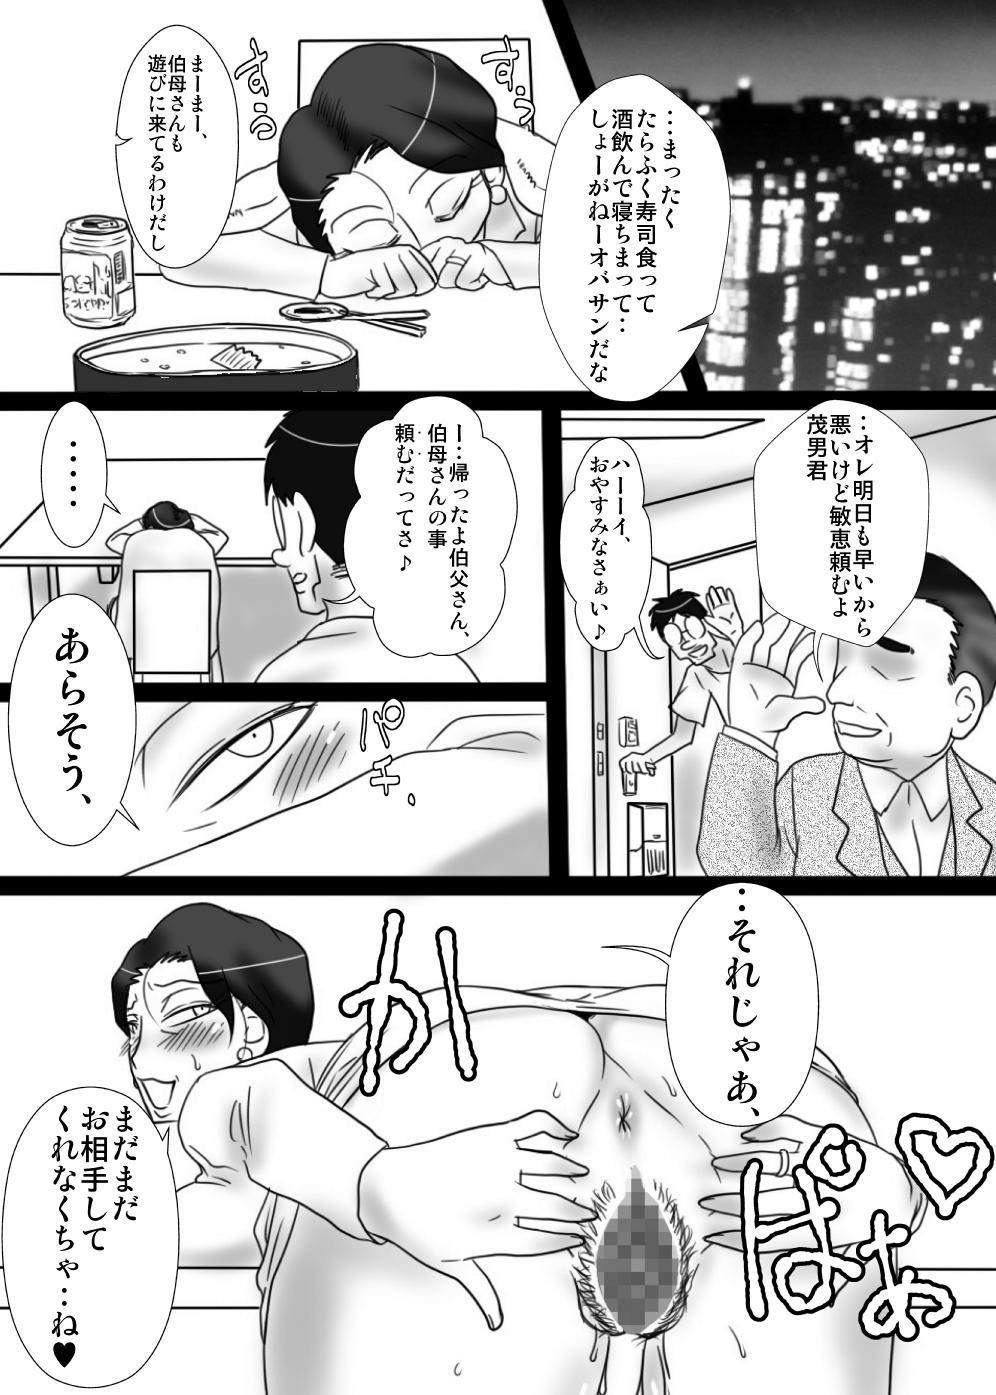 Oba-san o Otosuze! 49